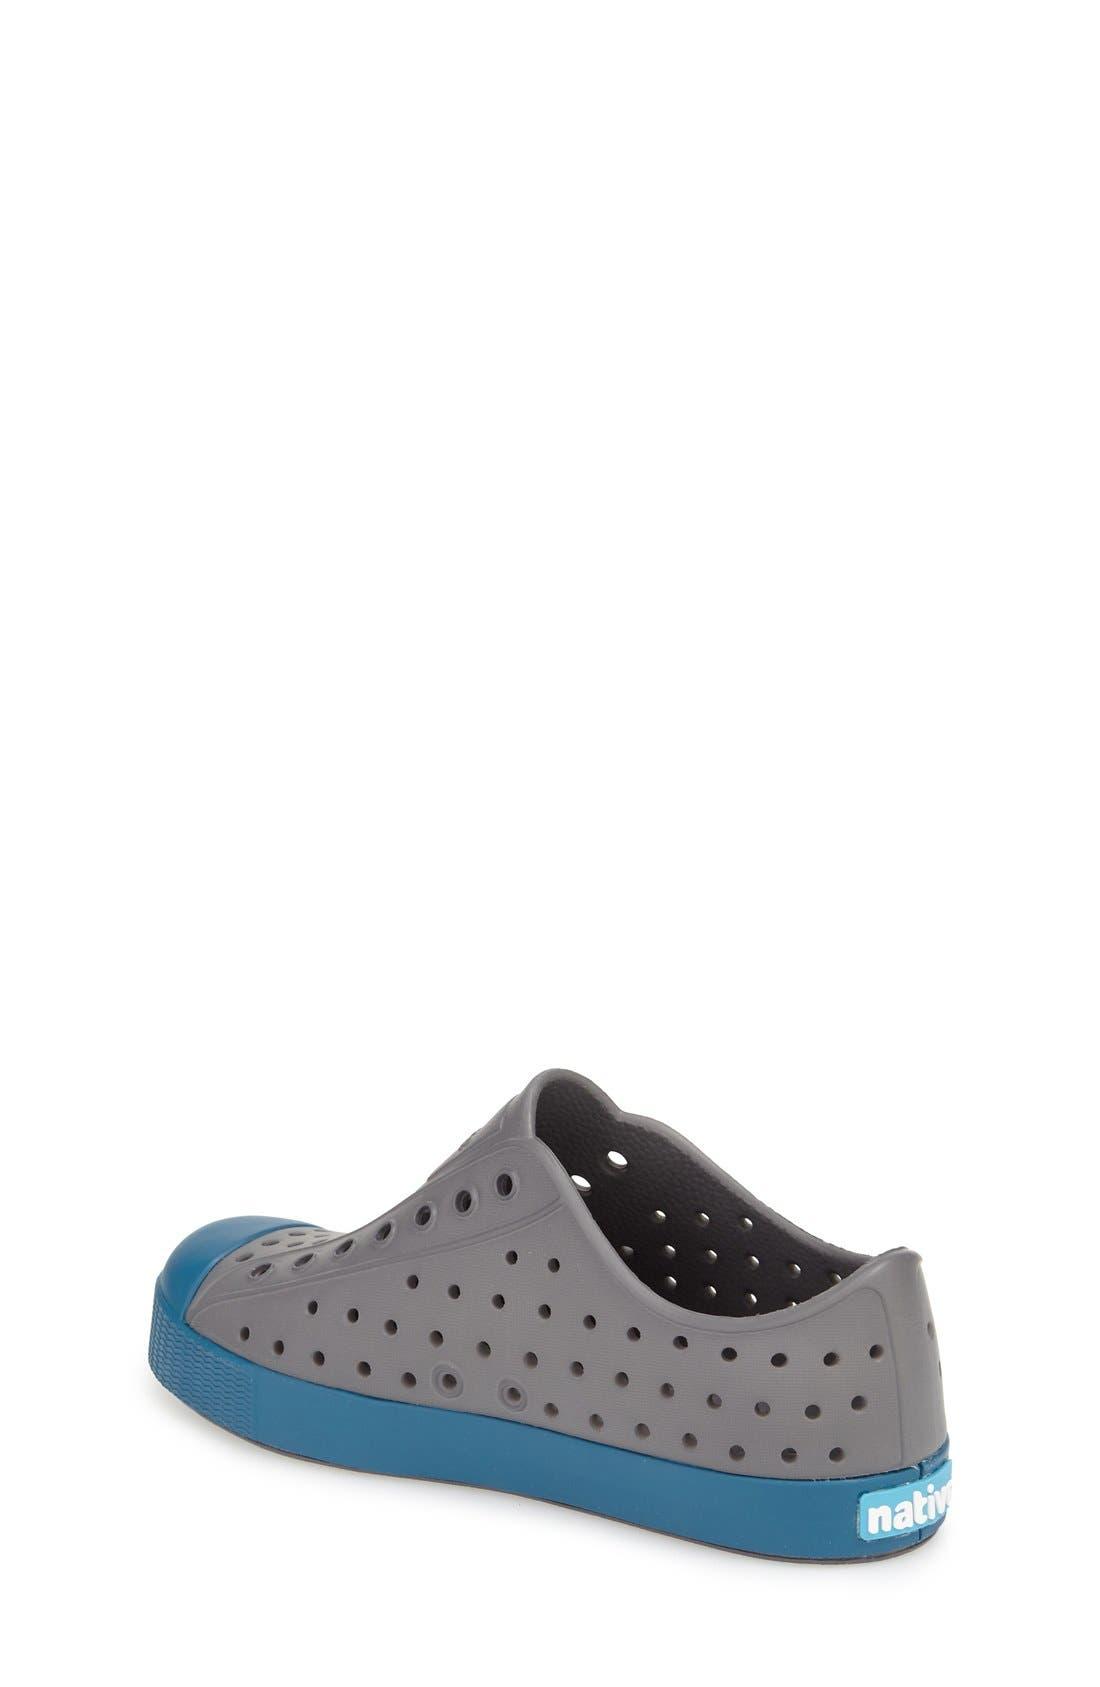 'Jefferson' Water Friendly Slip-On Sneaker,                             Alternate thumbnail 91, color,